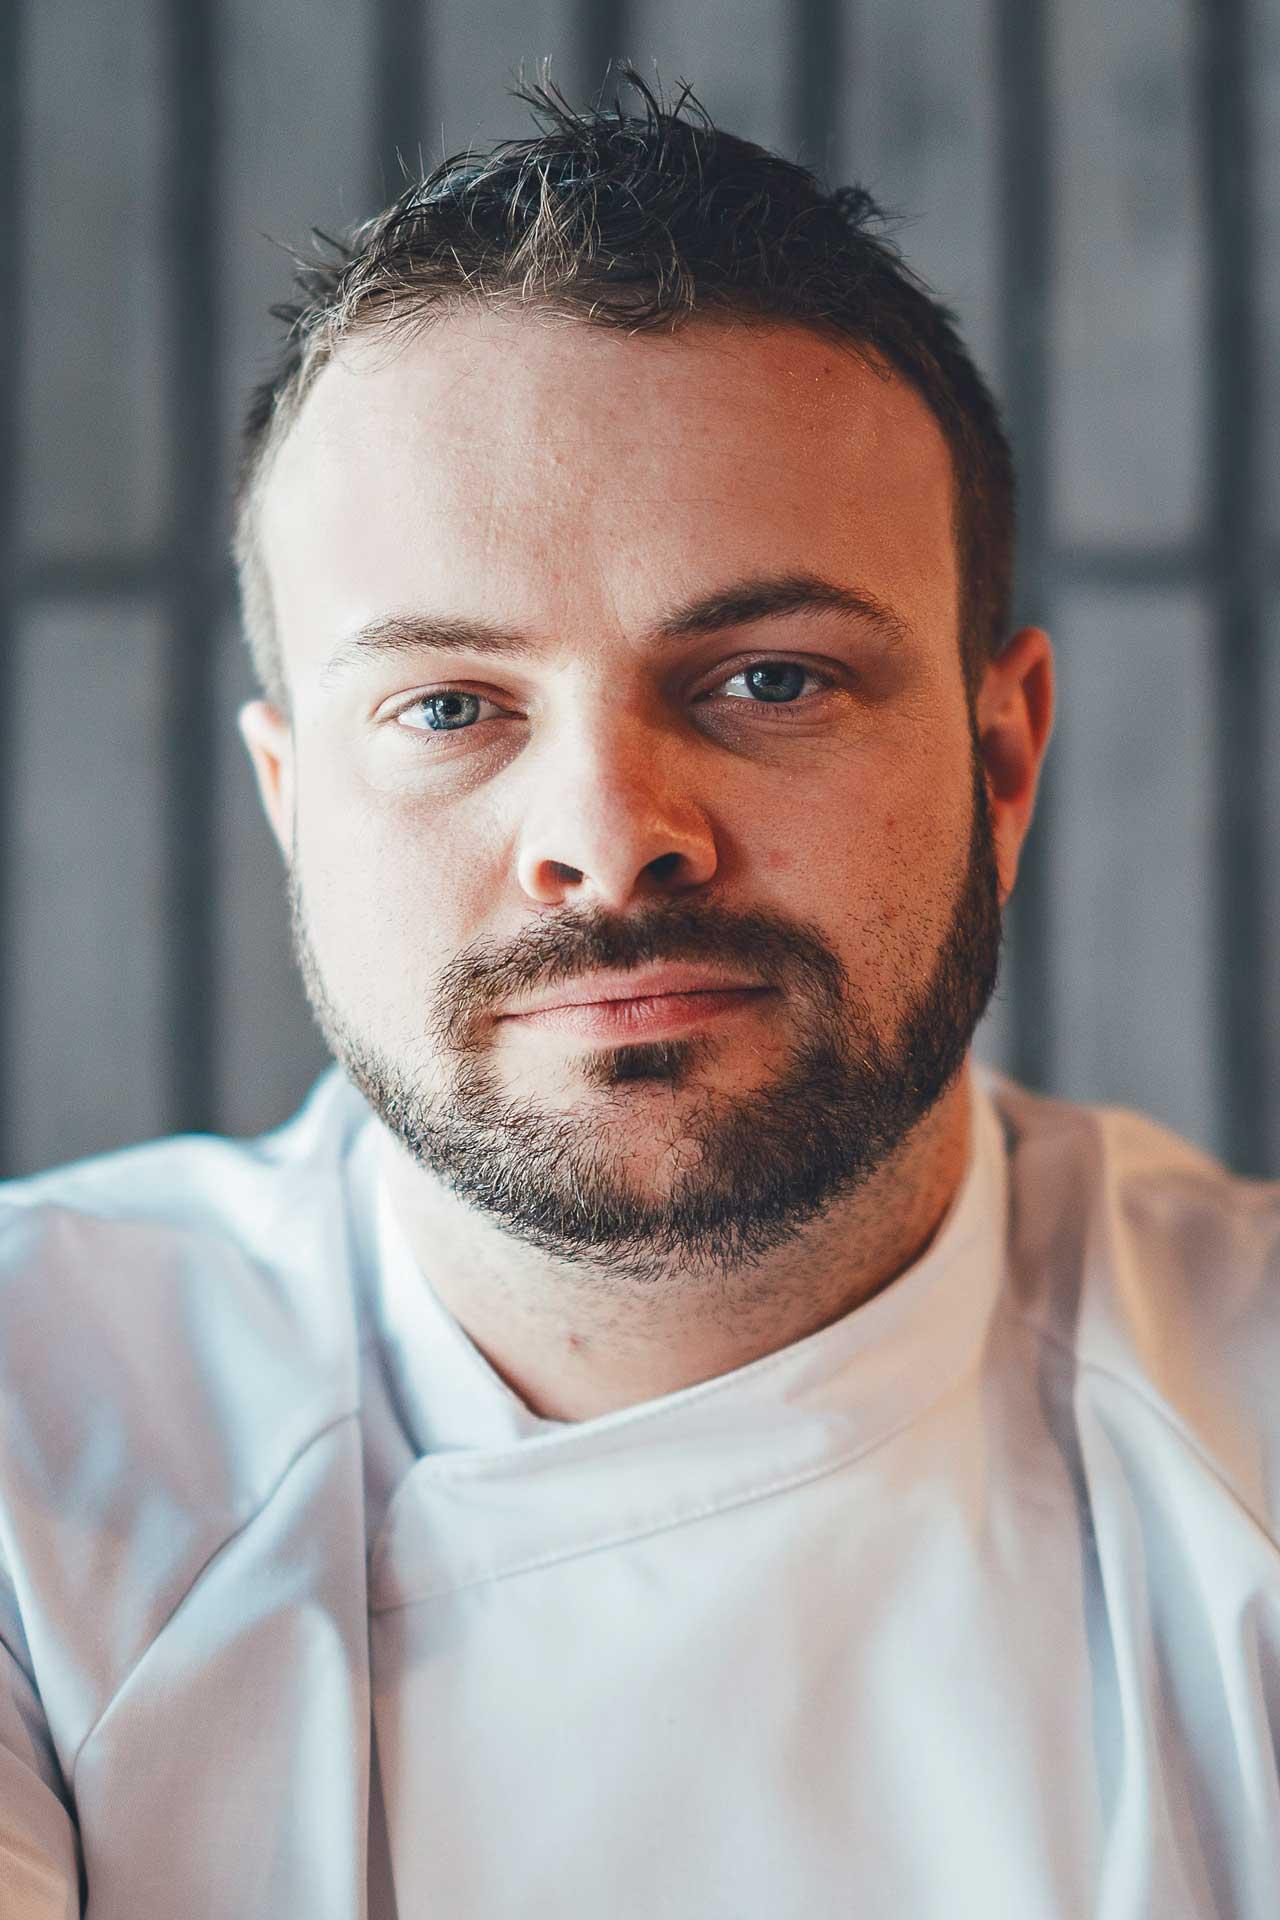 Adam Rawson, Executive Chef at The Standard